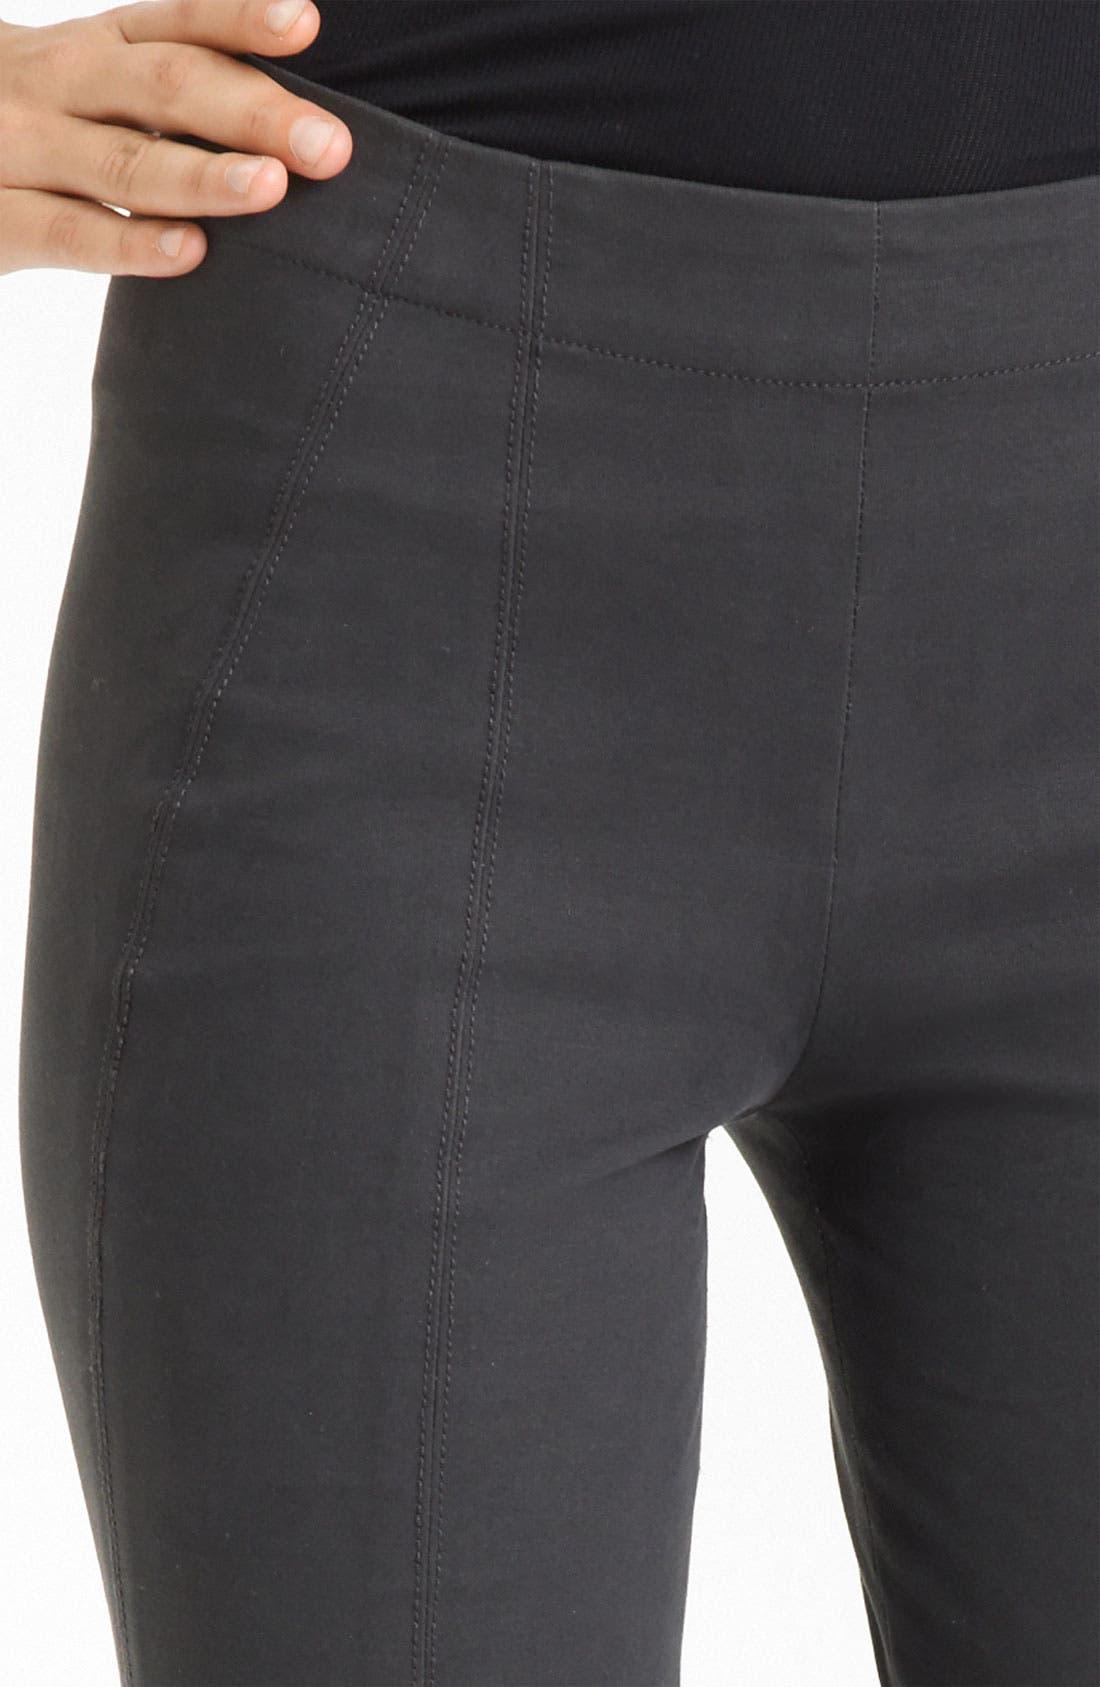 Alternate Image 2  - Donna Karan Collection Matte Stretch Cotton Leggings